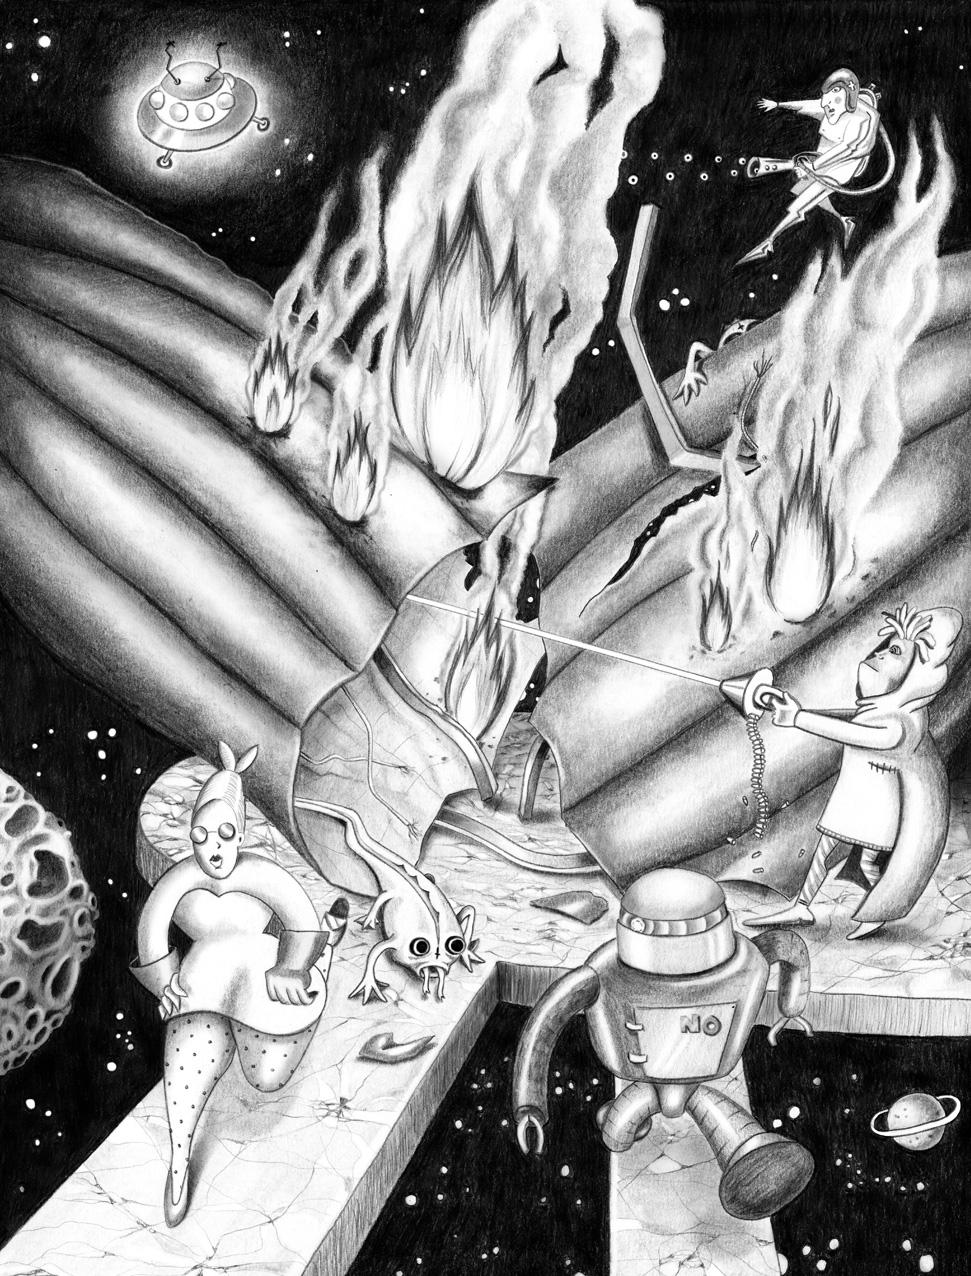 Illustrations #4